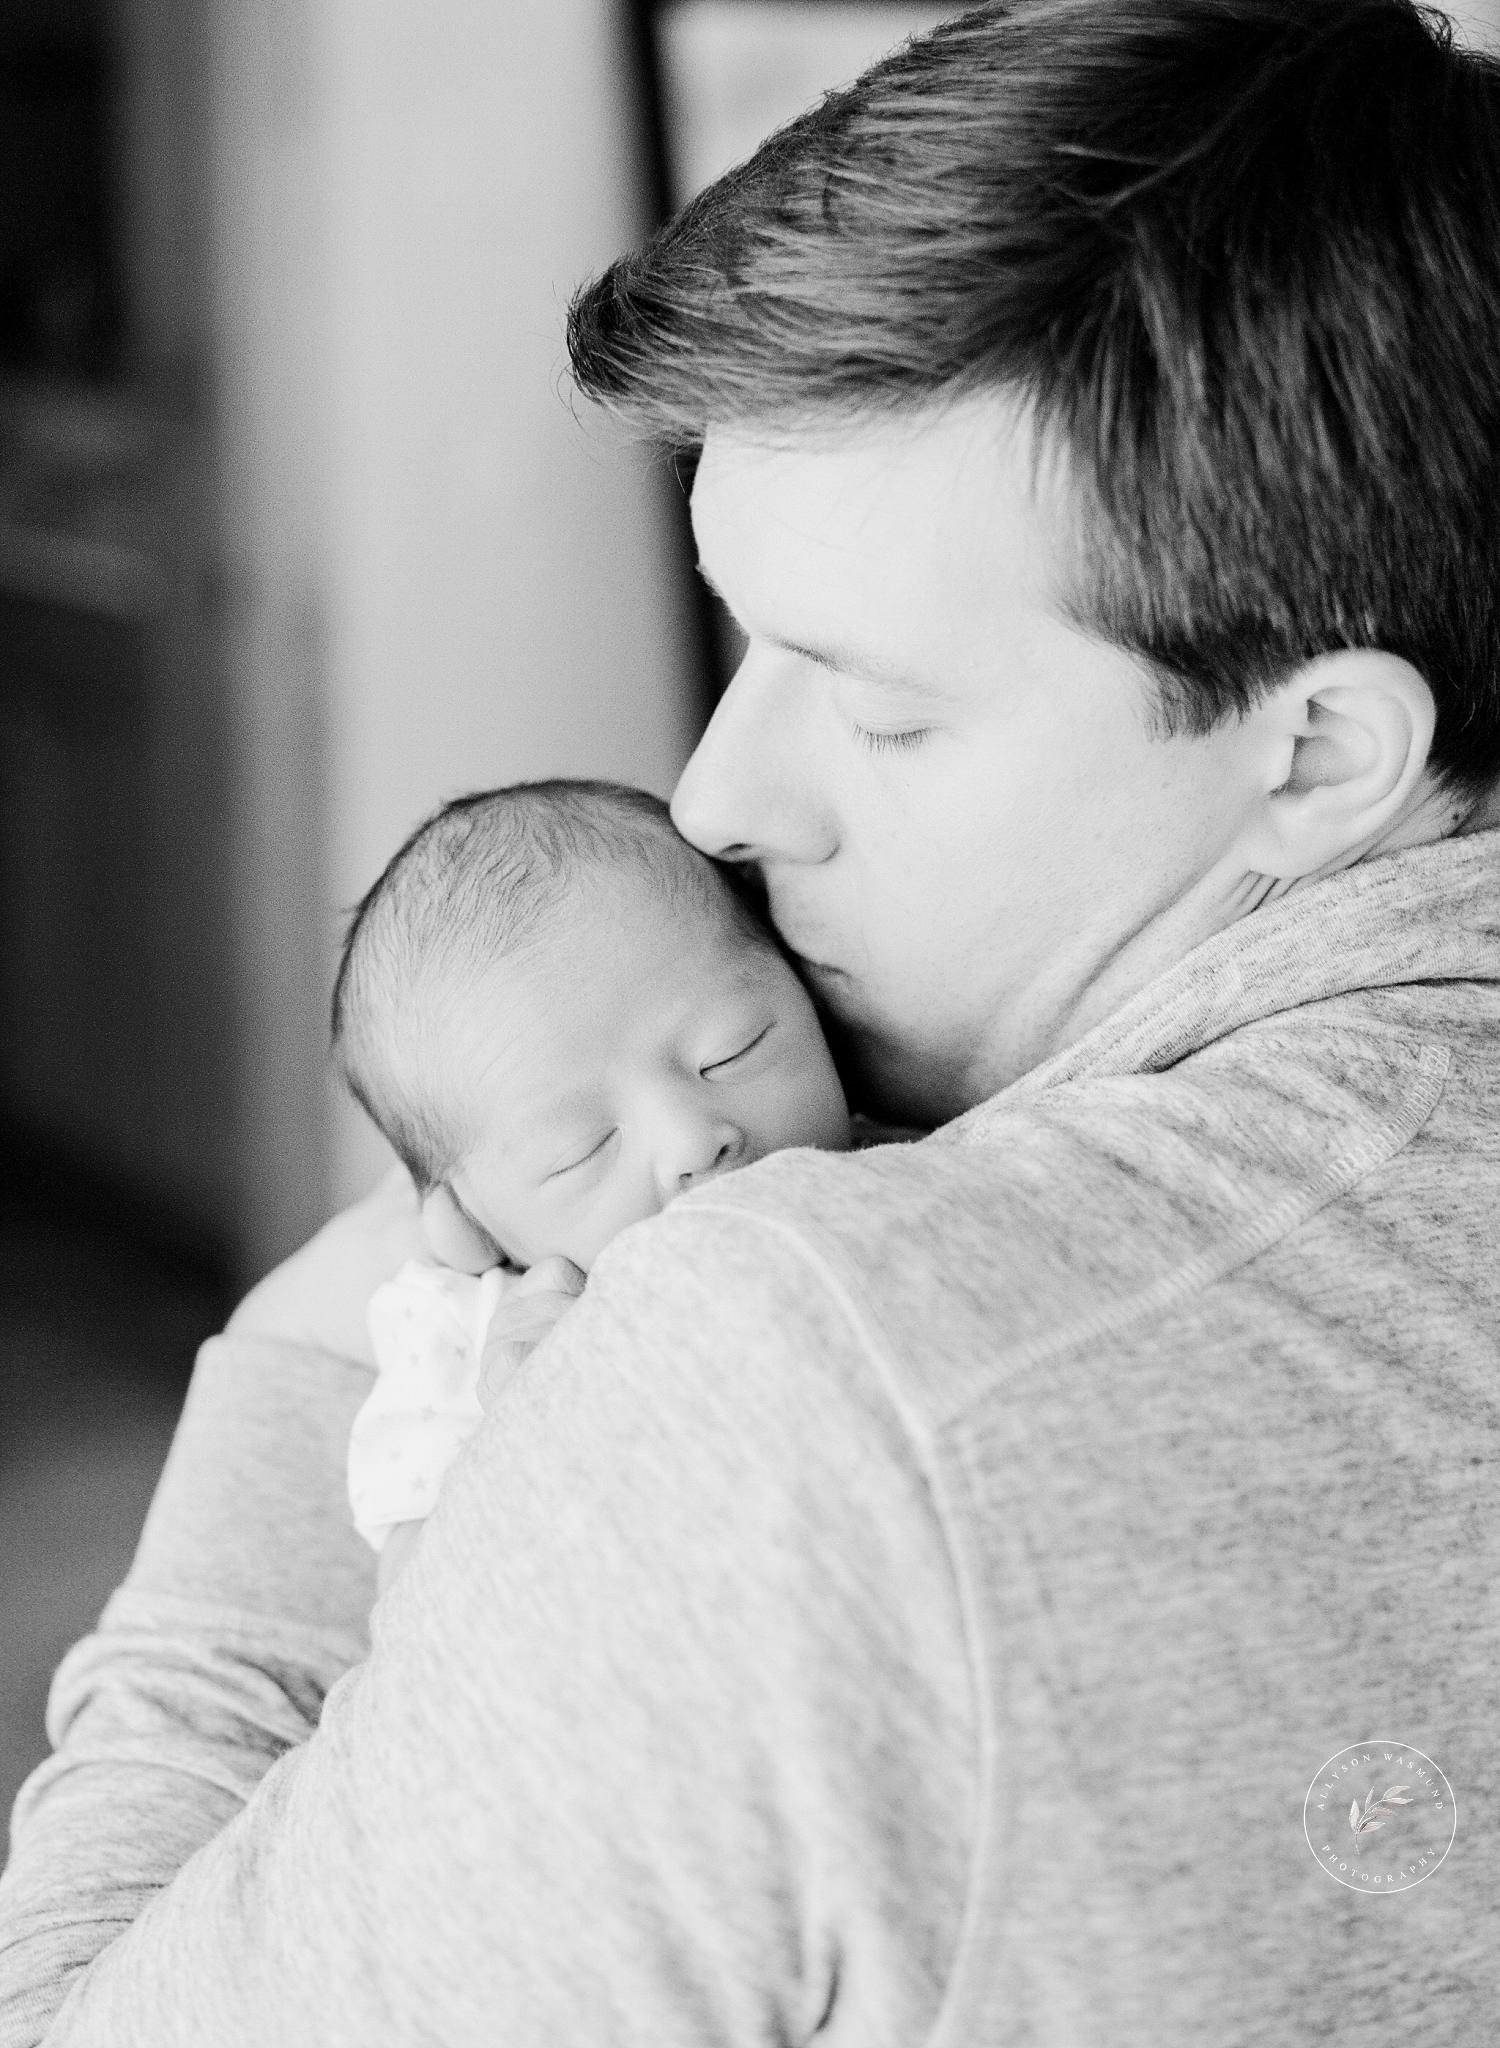 st-paul-mn-in-home-newborn-photographer-preston_0014.jpg